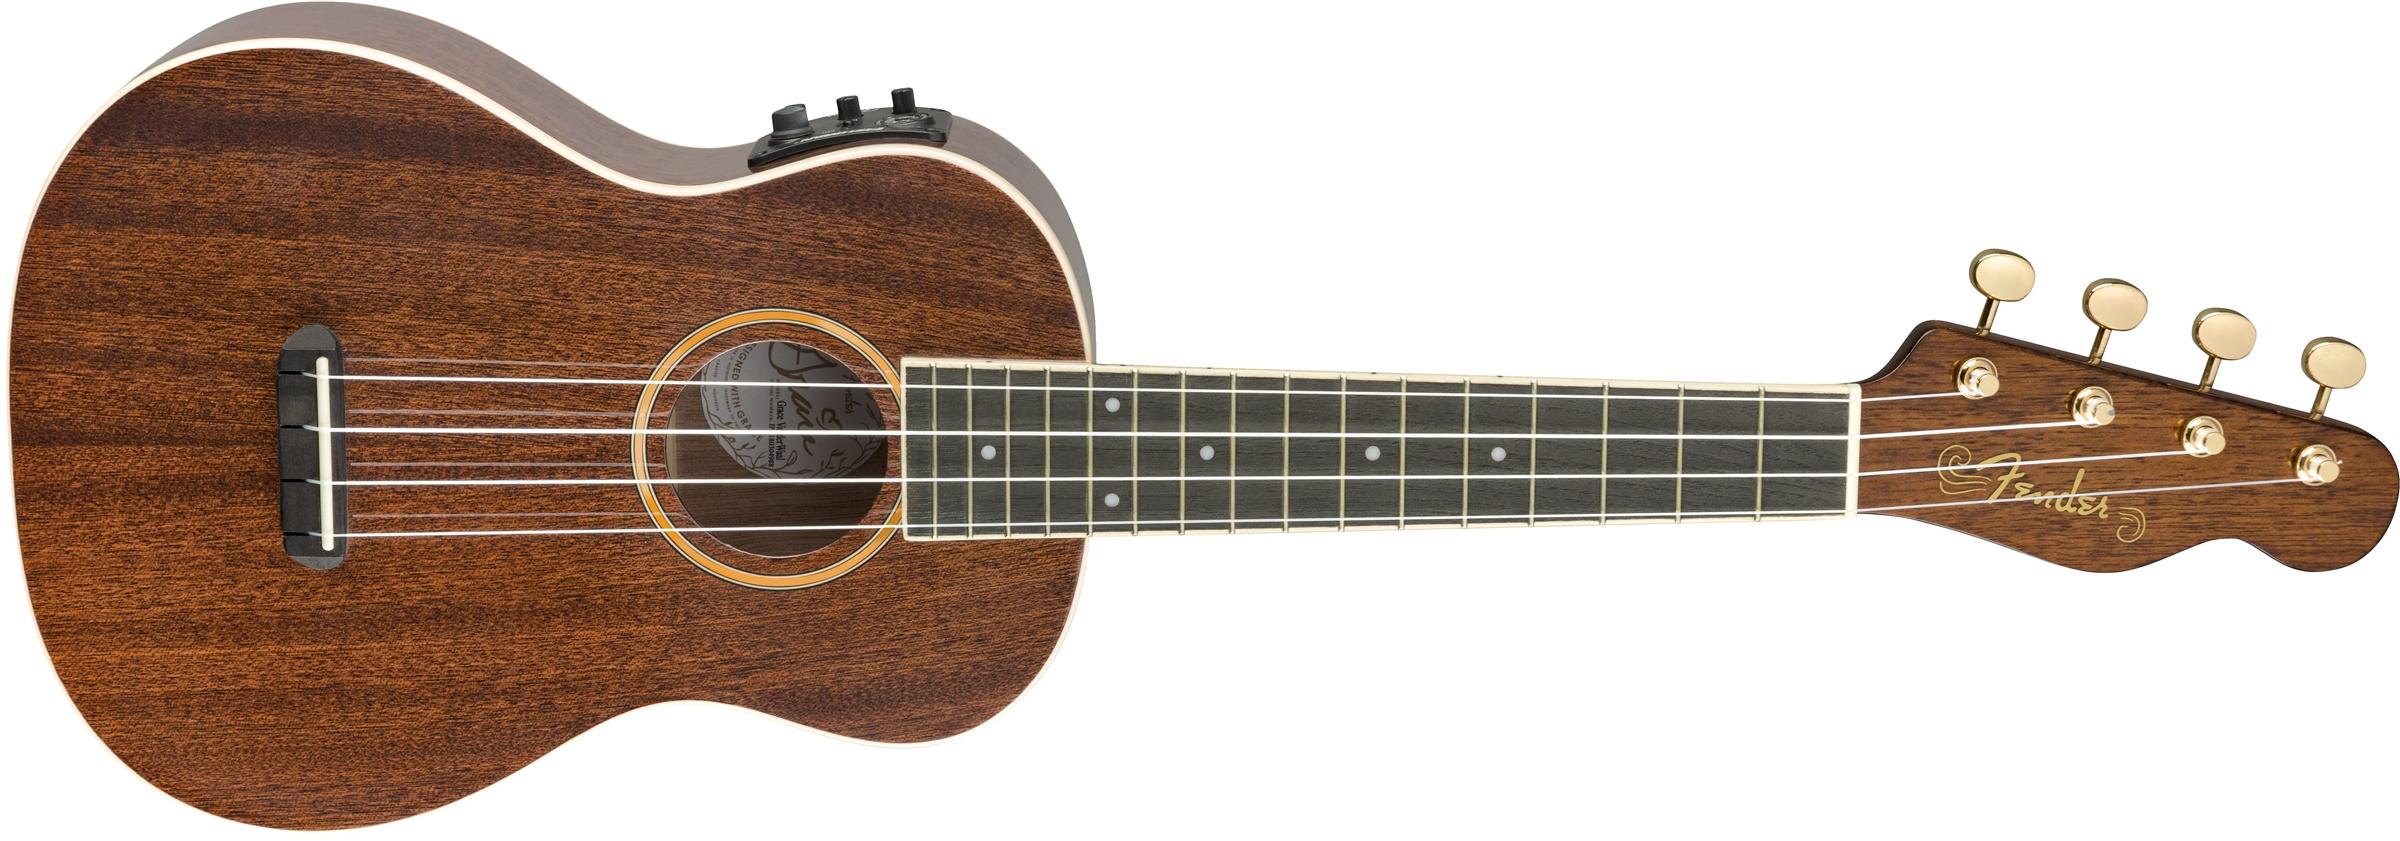 Grace Vanderwaal Ukulele : grace vanderwaal signature ukulele ukuleles ~ Vivirlamusica.com Haus und Dekorationen